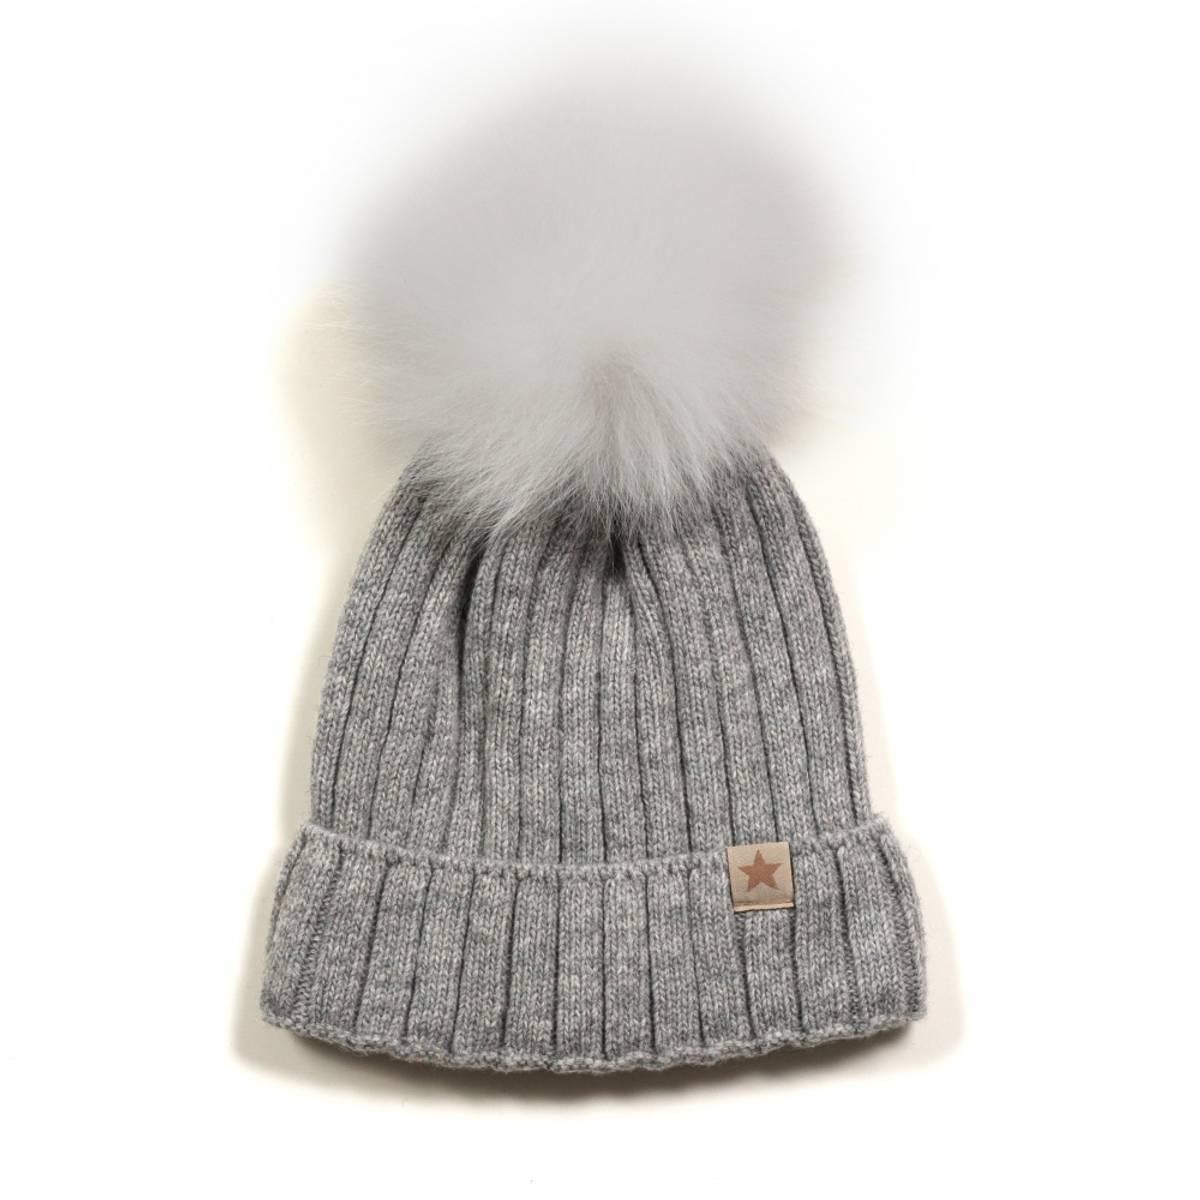 HUTTELiHUT warmy strikkelue m/ alpakka dusk - light grey